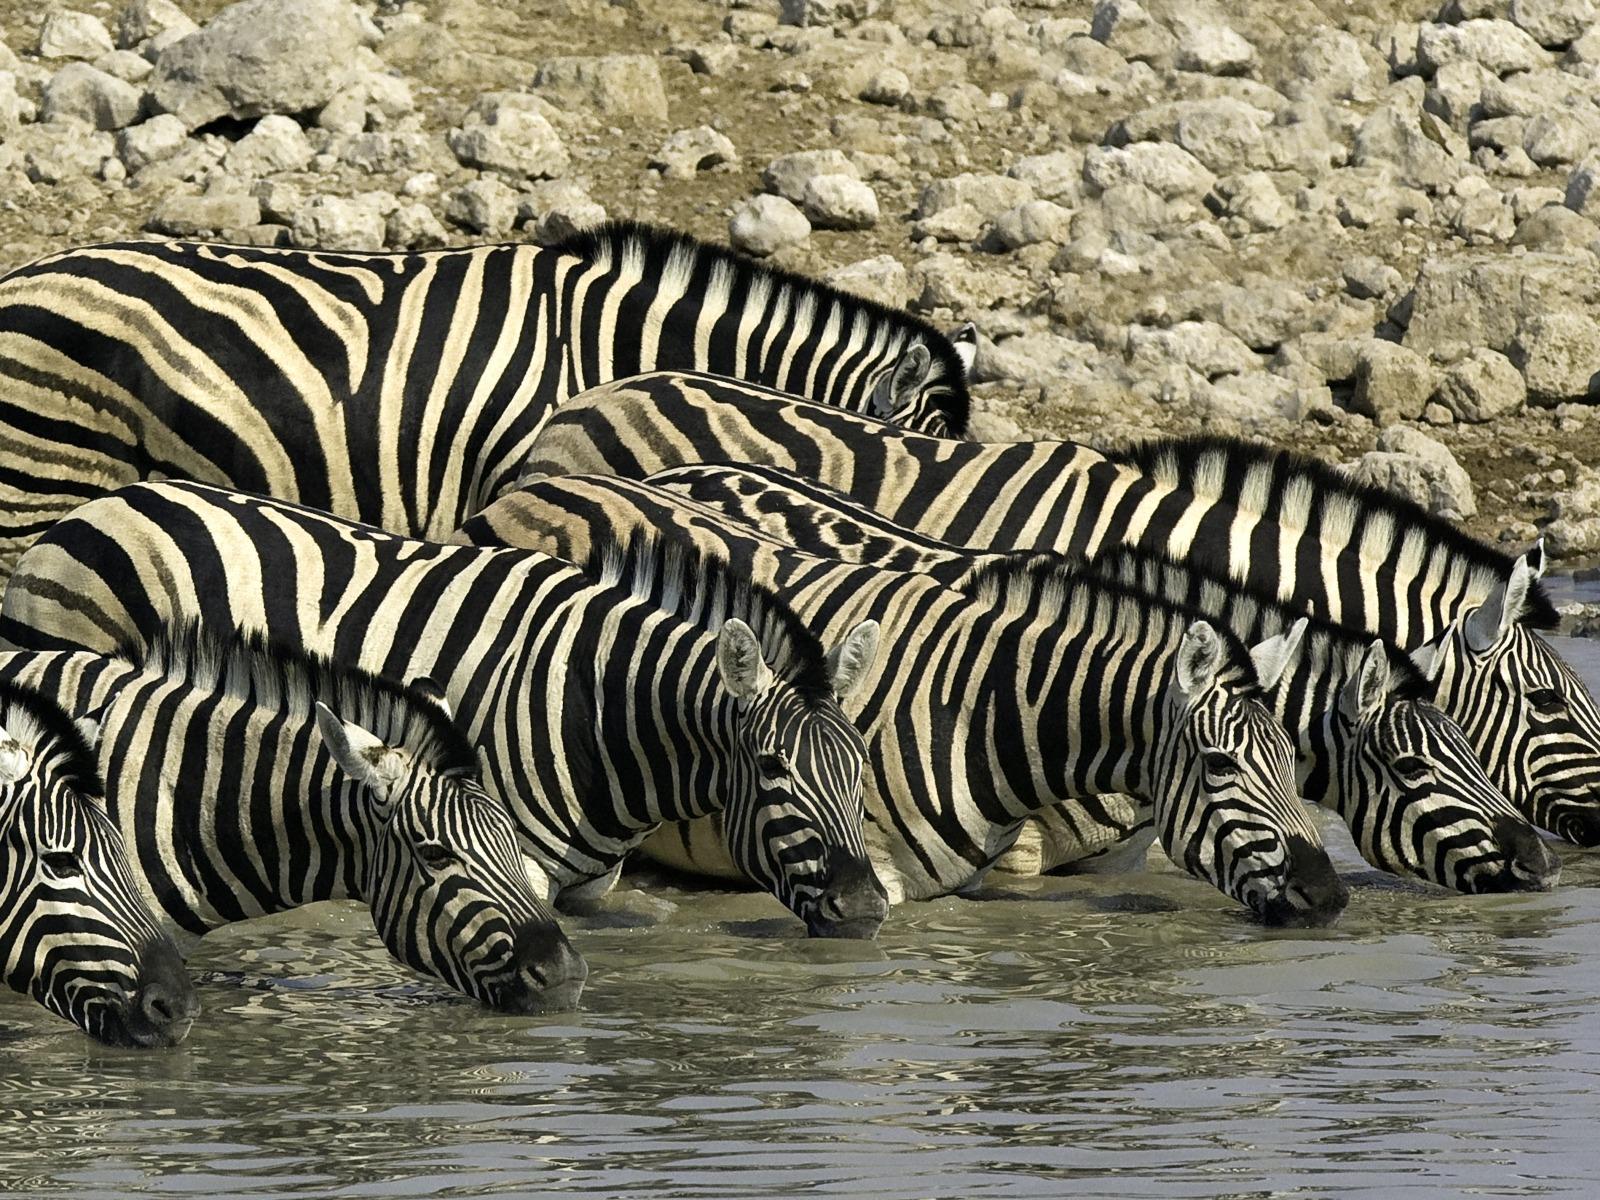 Wilderness Safari - Ongava53_1600x1200.jpg